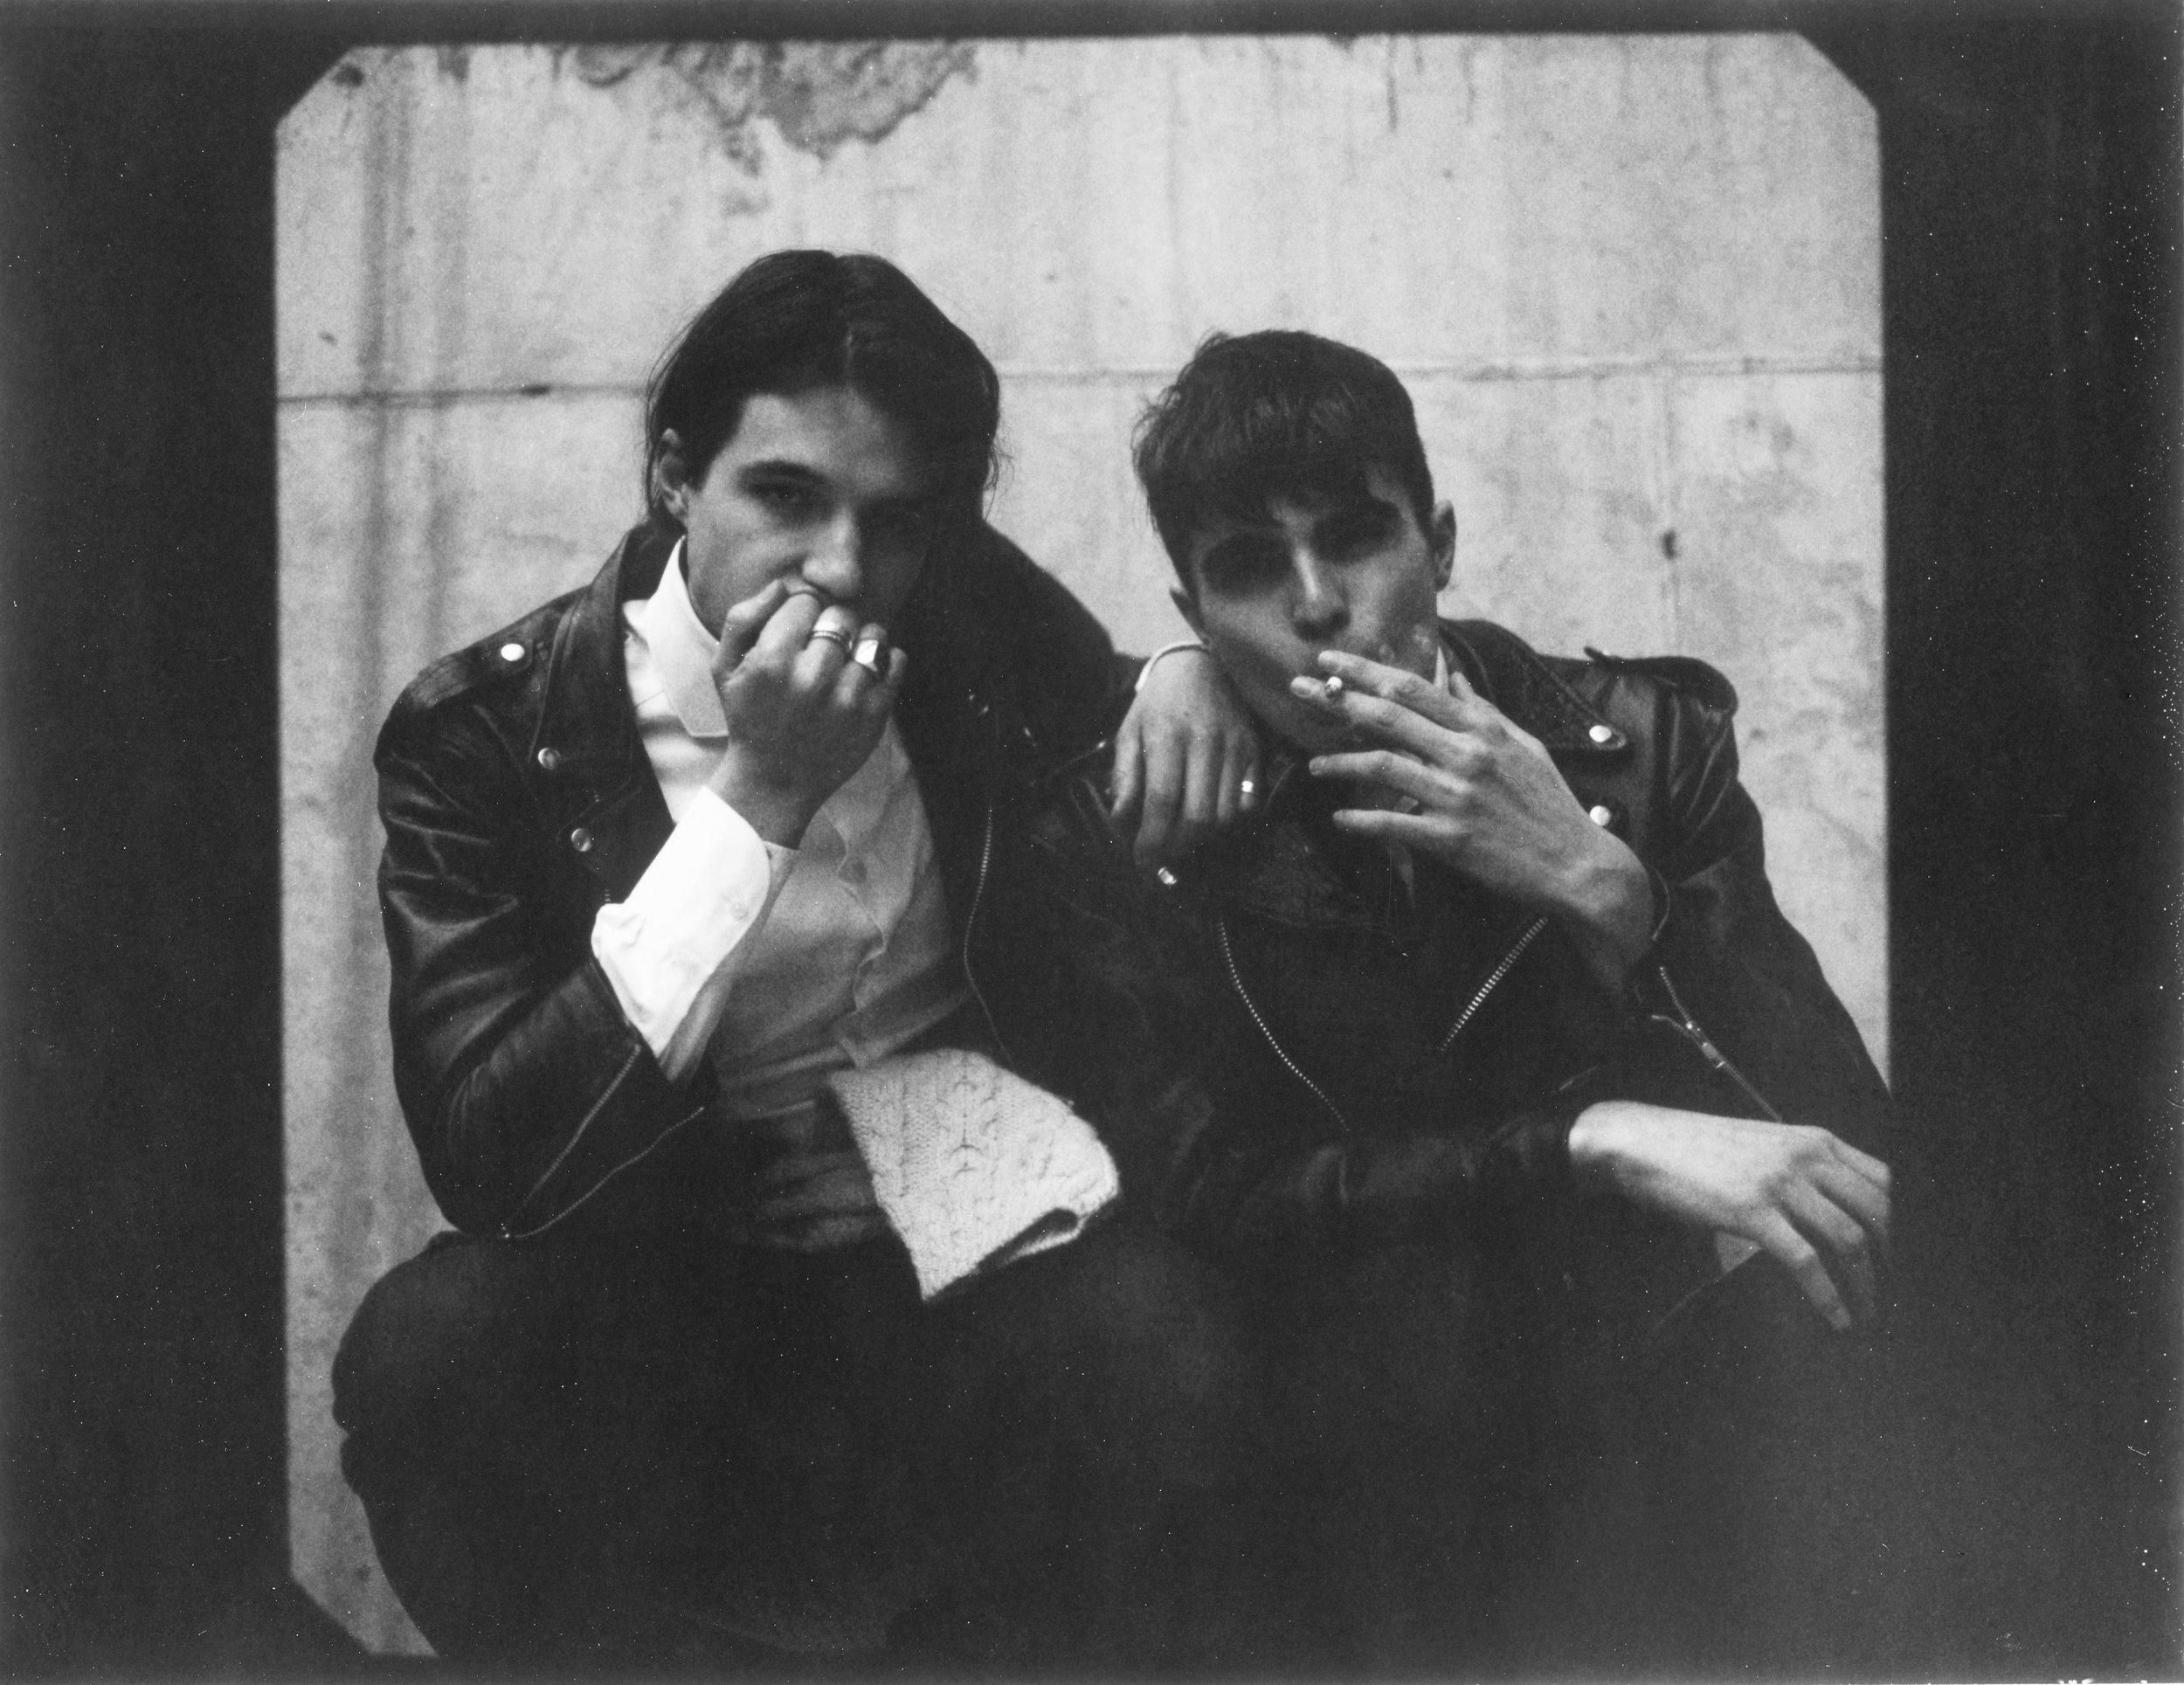 Diego&Nick-28.jpg